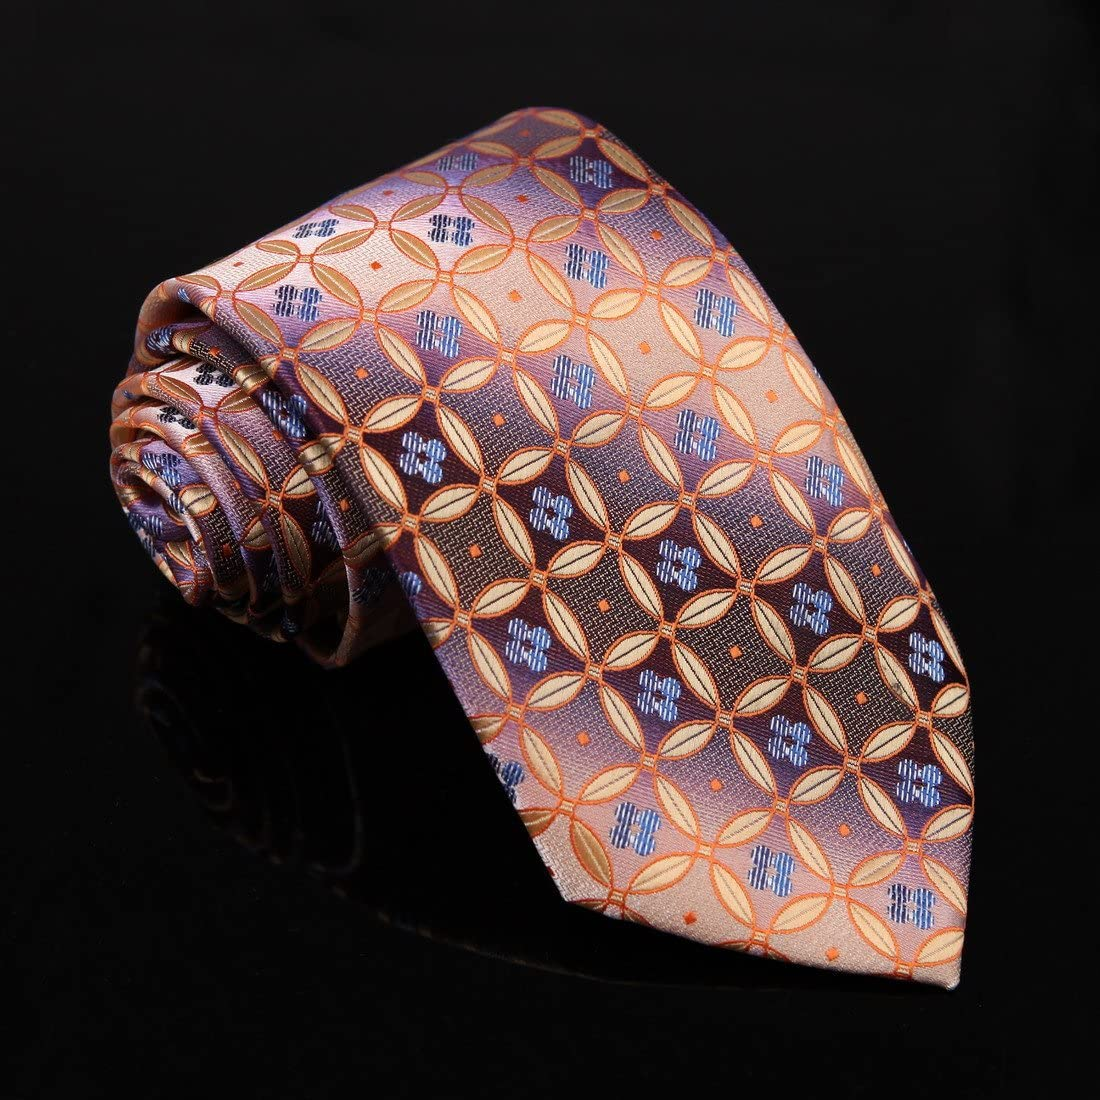 DAA7B25B Indigo Pink Blue Patterned Microfiber Tie Friendship For Formal Neck Tie By Dan Smith